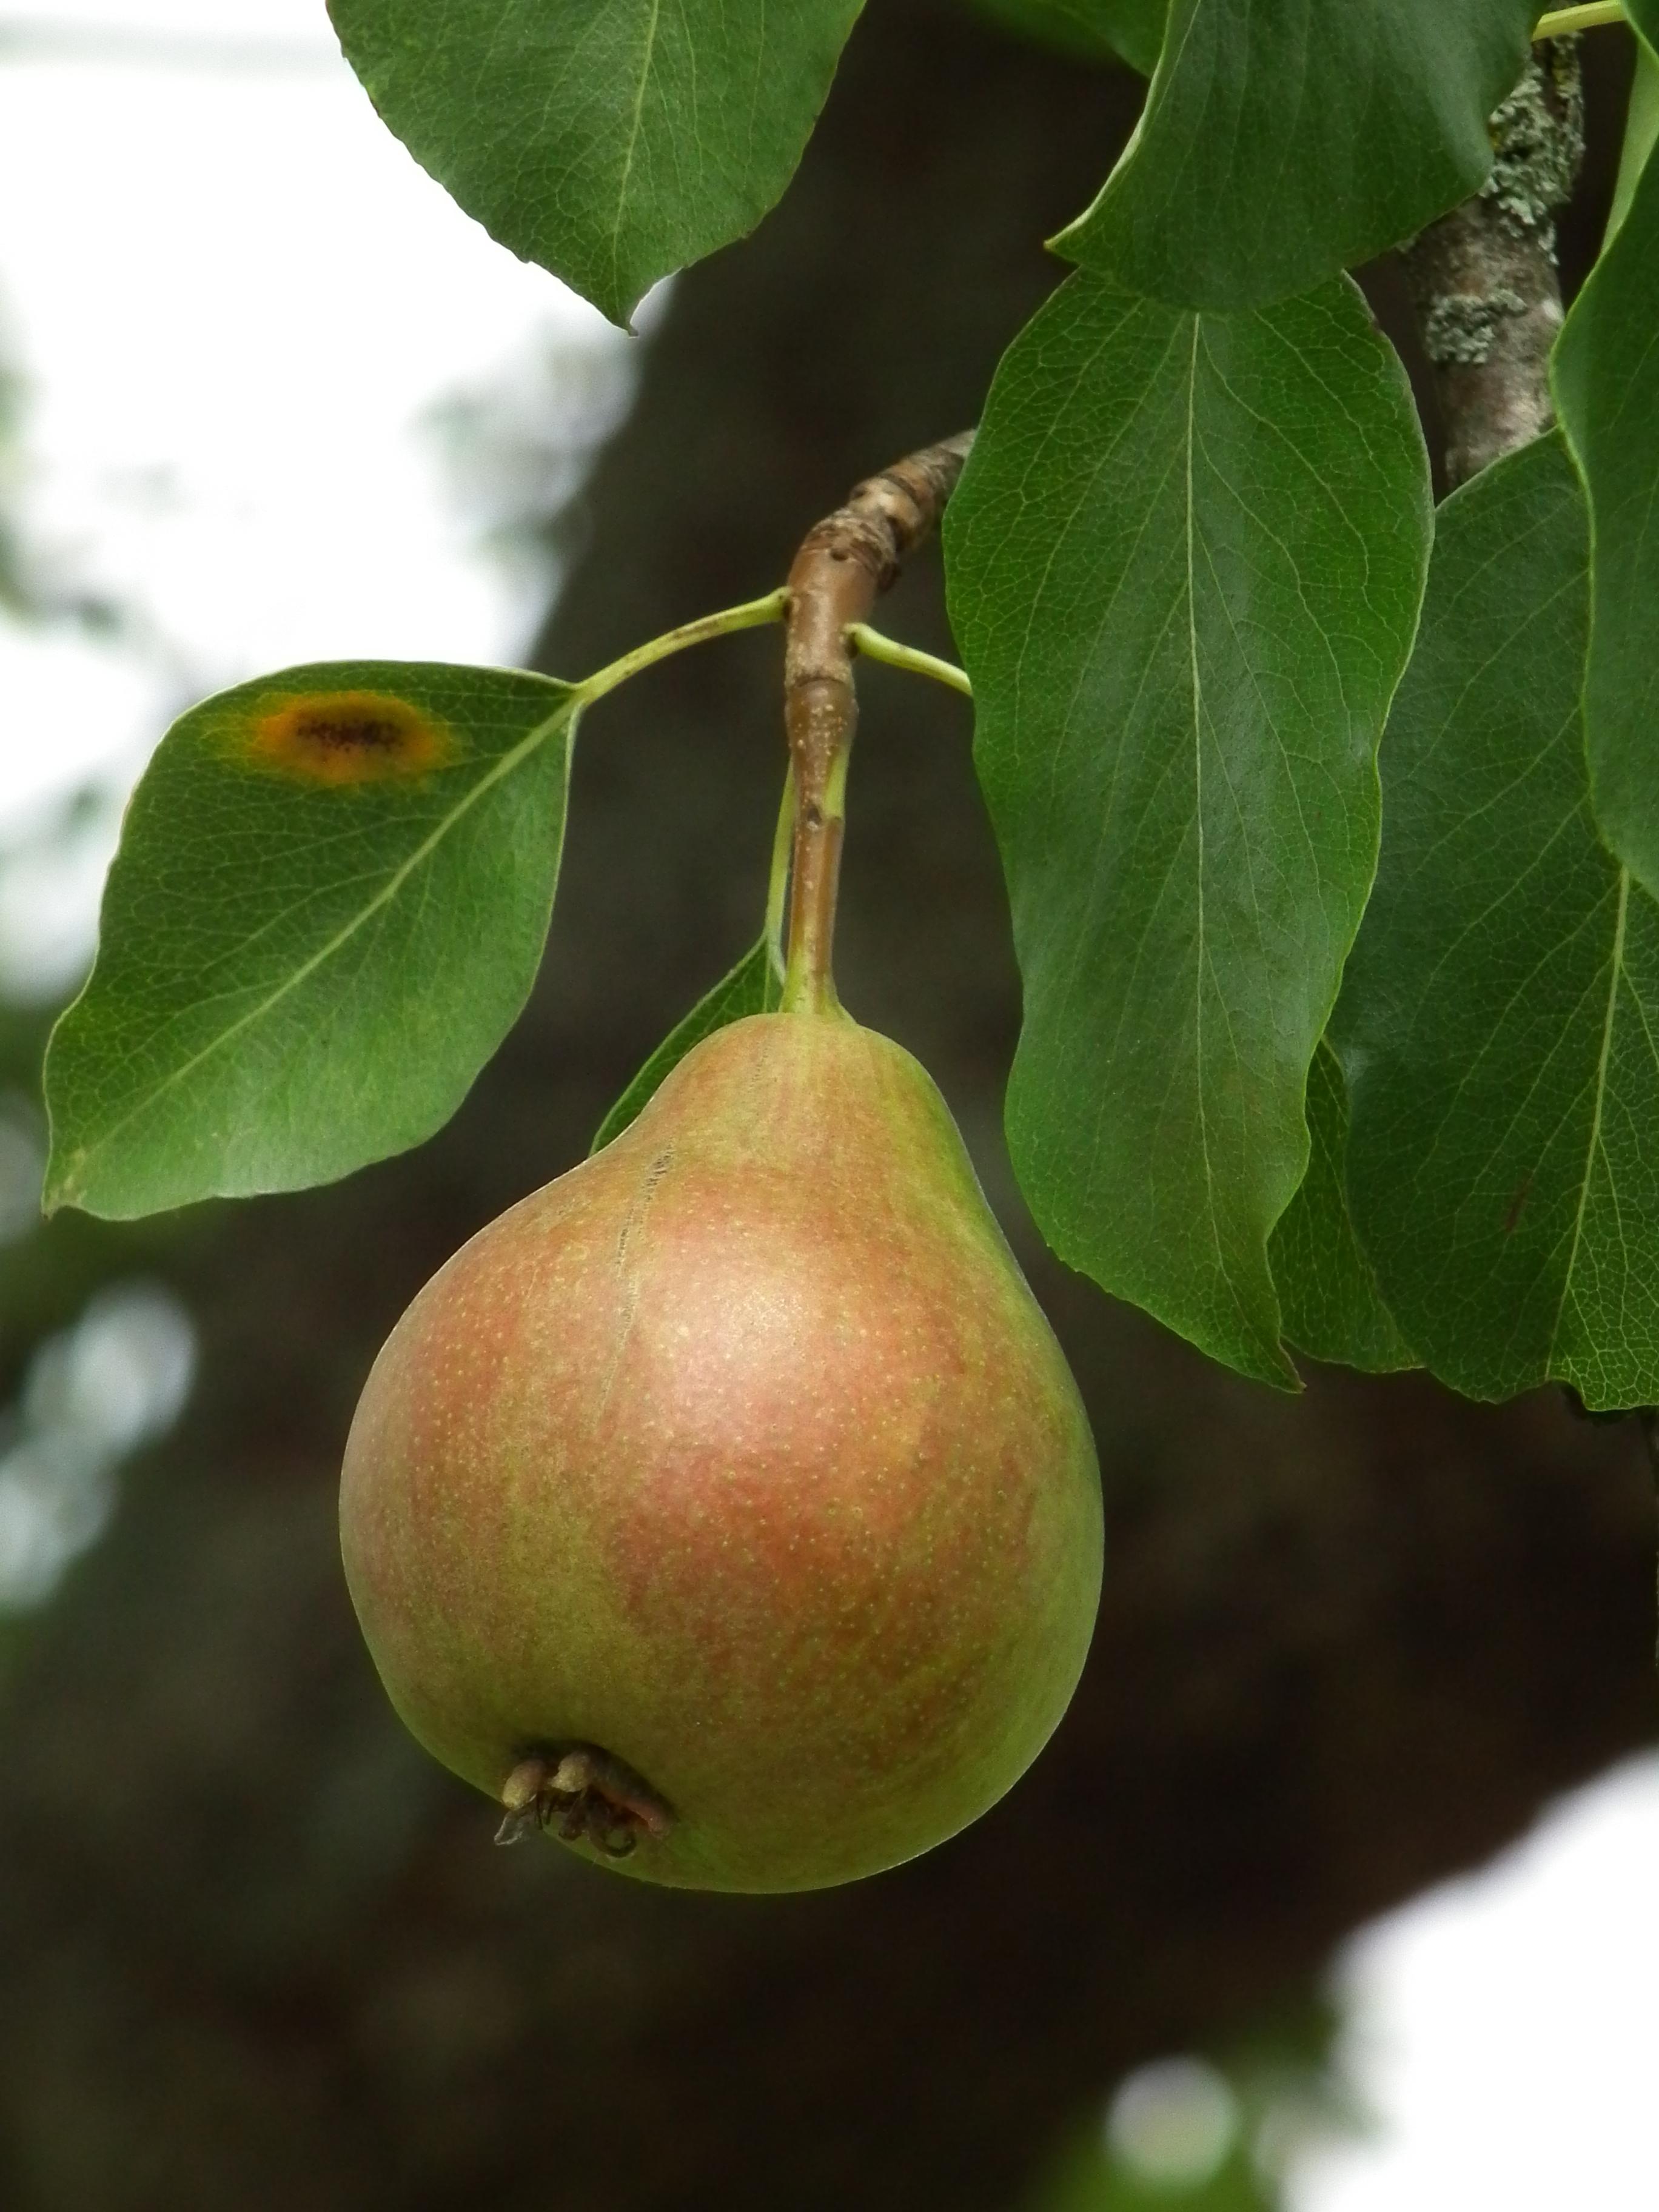 File:Einzelne Birne an Baum.JPG - Wikimedia Commons